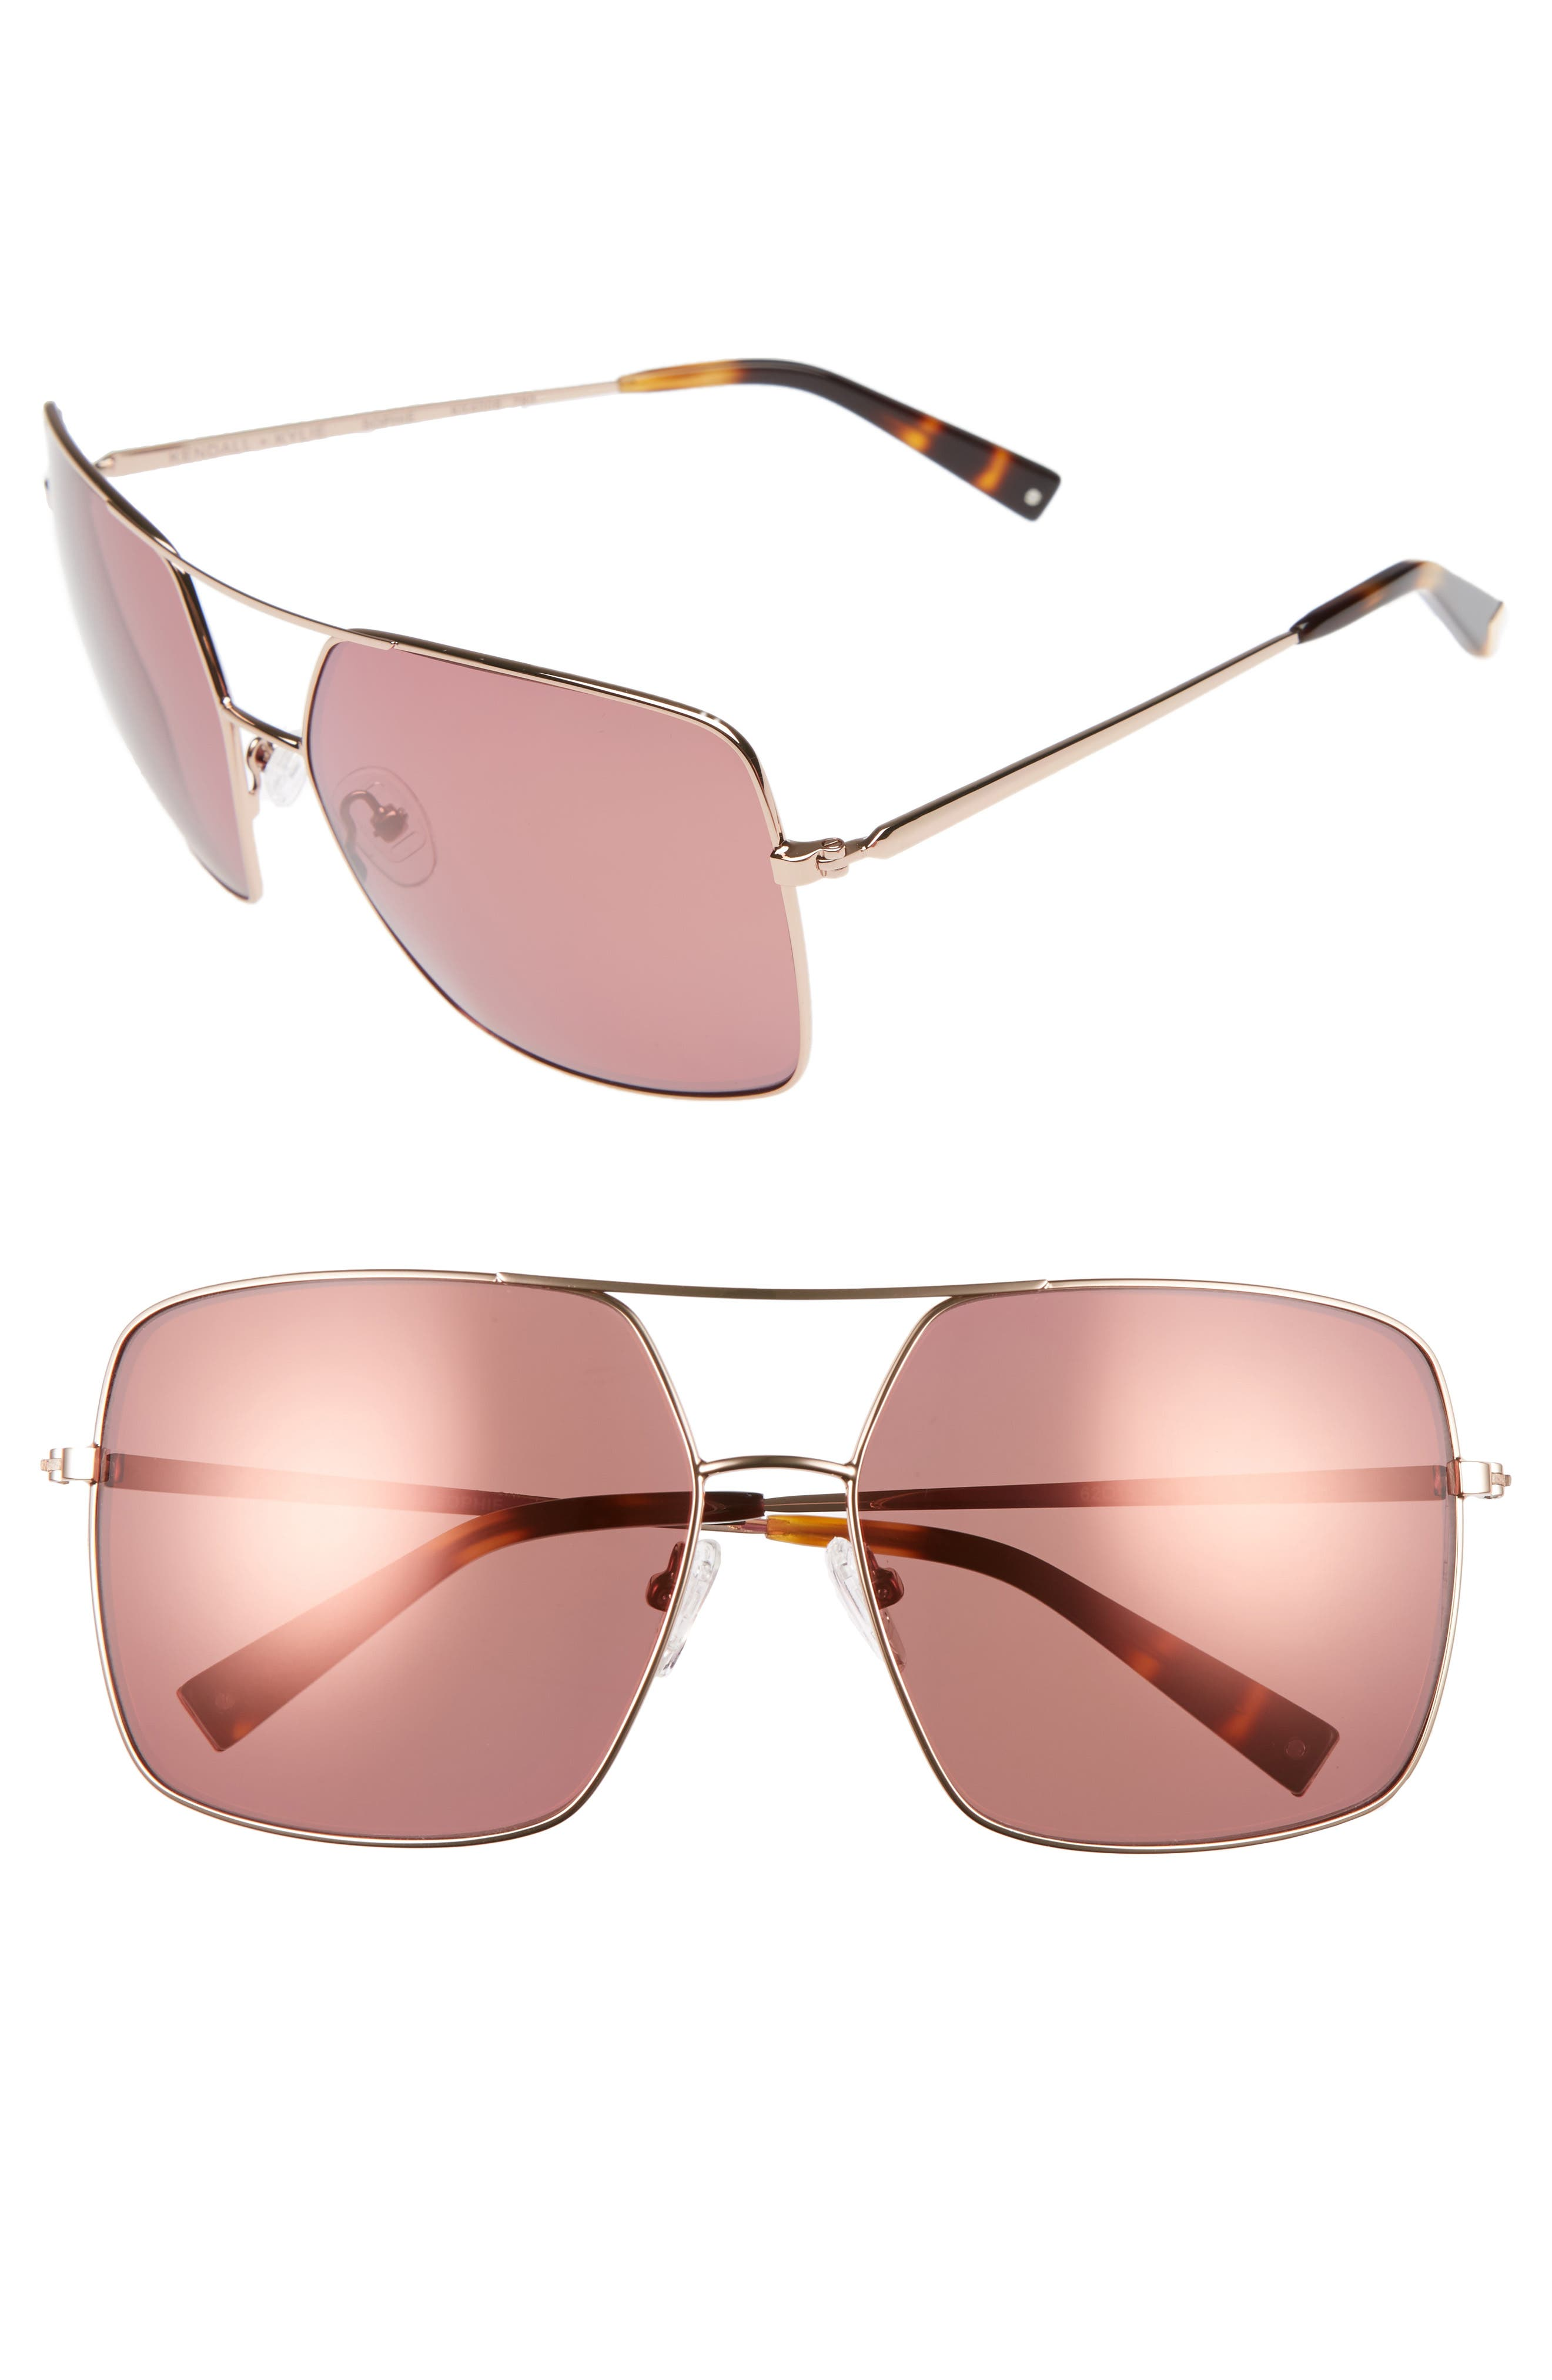 KENDALL + KYLIE 65mm Navigator Sunglasses